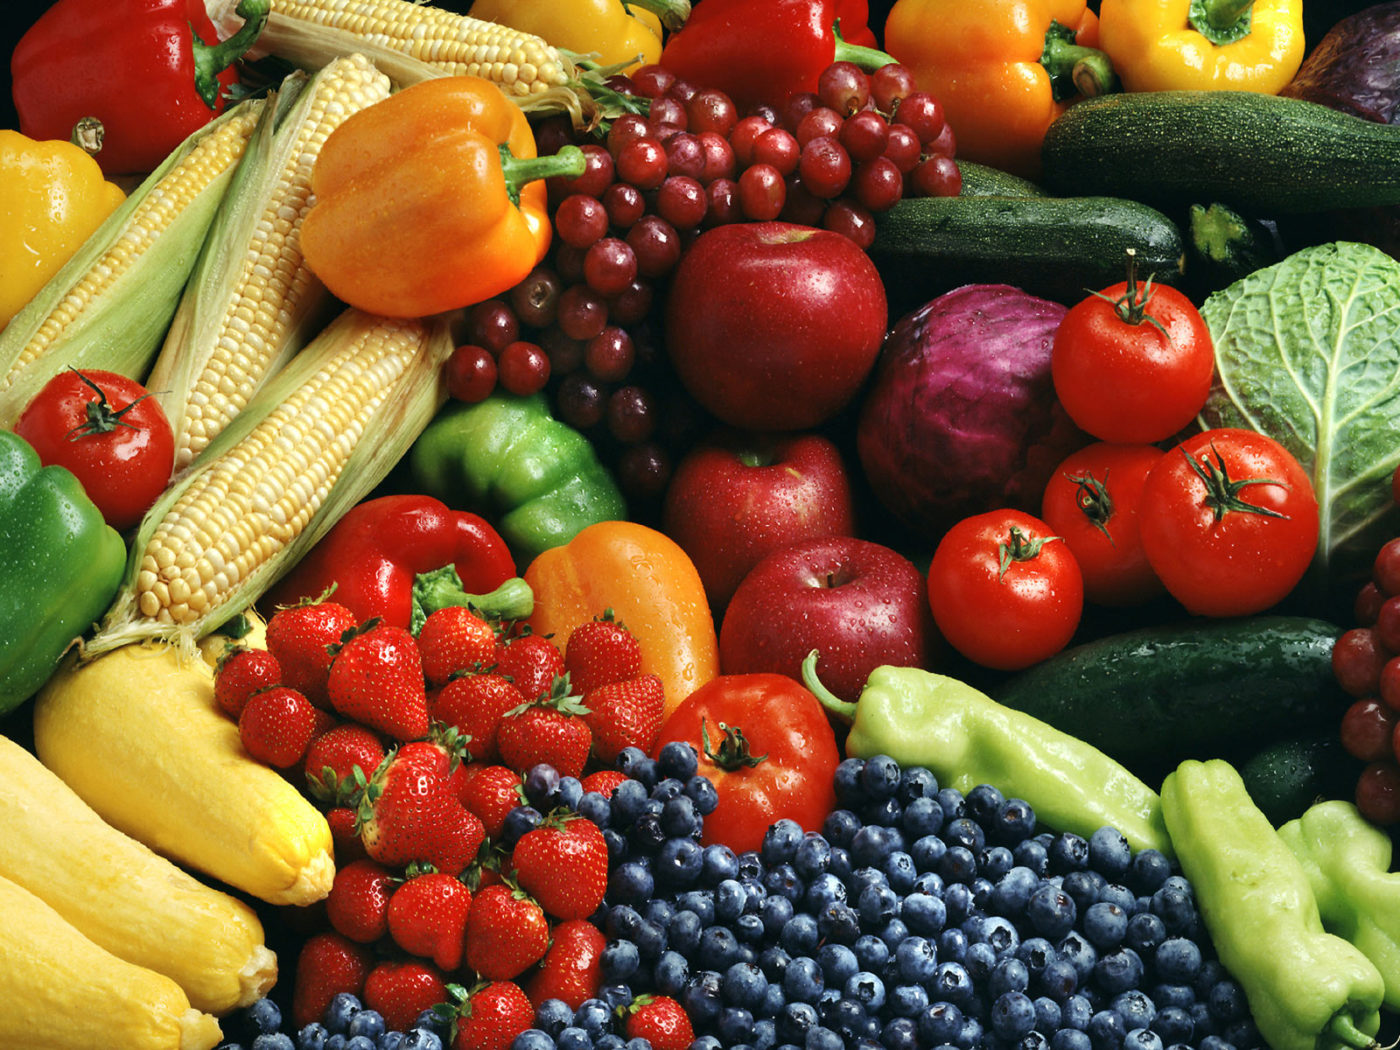 On Super Bowl Sunday, Veggies Are Most Popular Food | BlackPressUSA